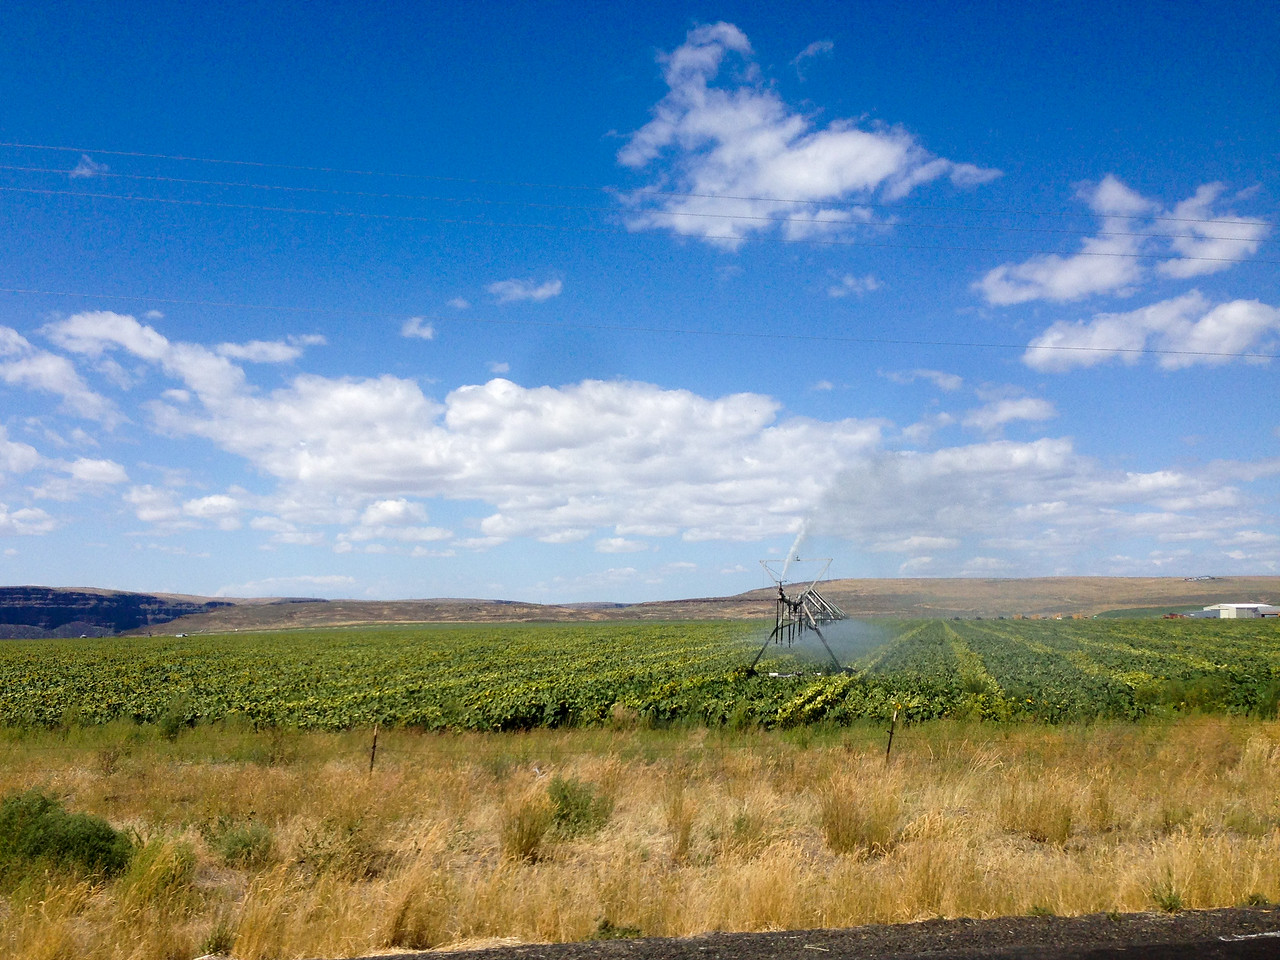 Lincoln County, WA Crop Irrigation